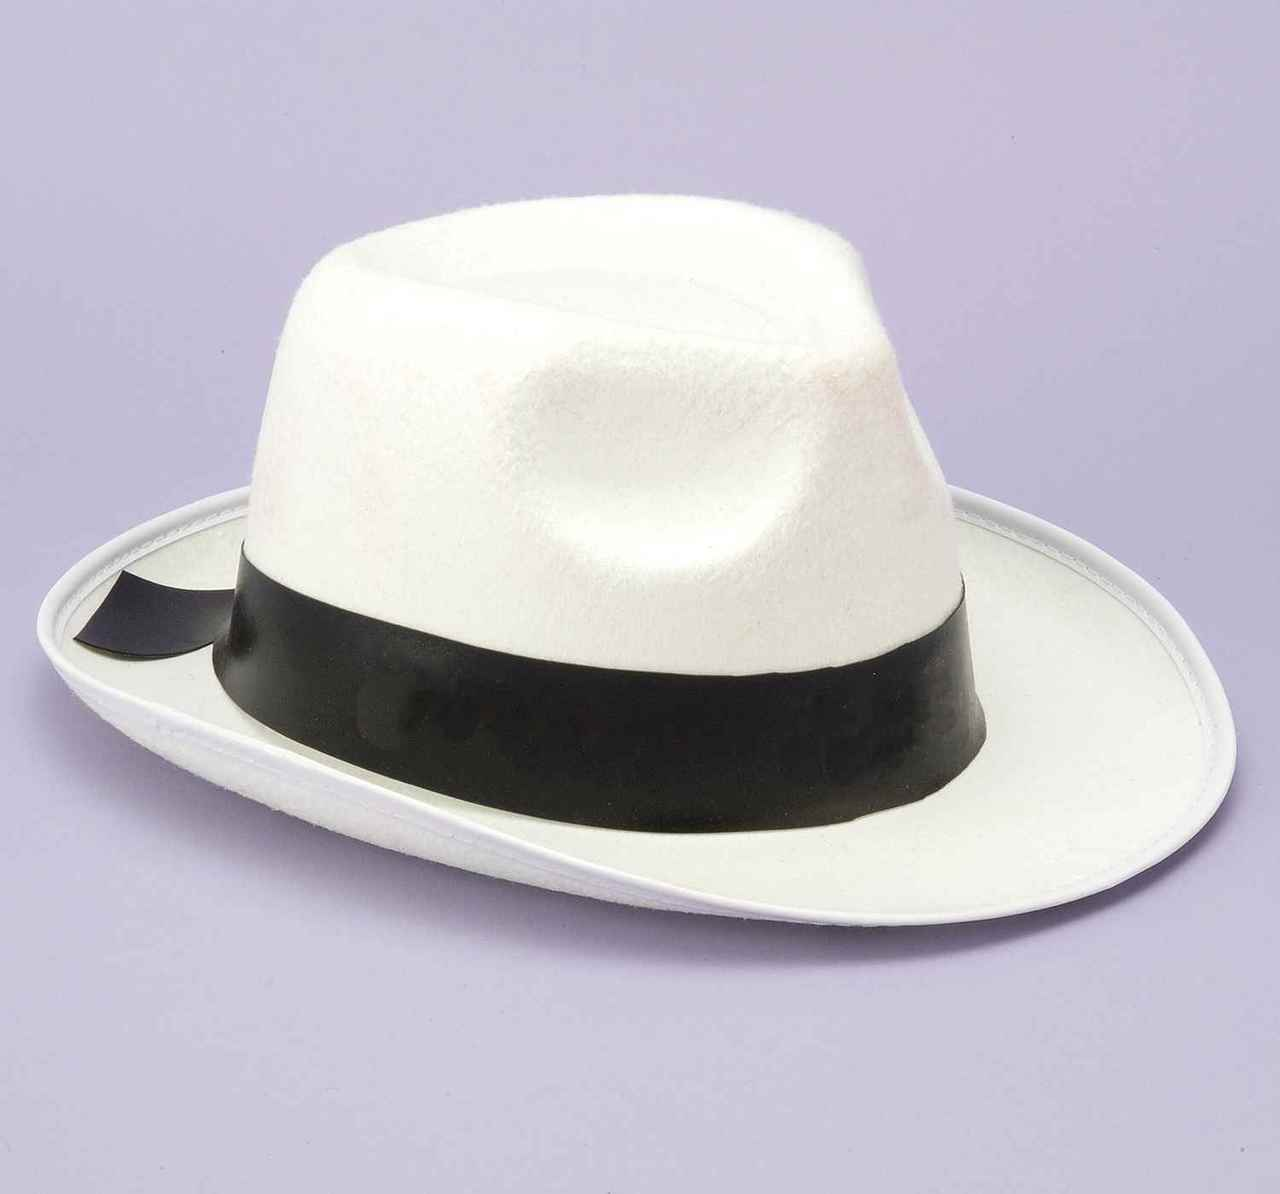 White Gangster Fedora Hat - The Costume Shoppe 5f6e7bd4432